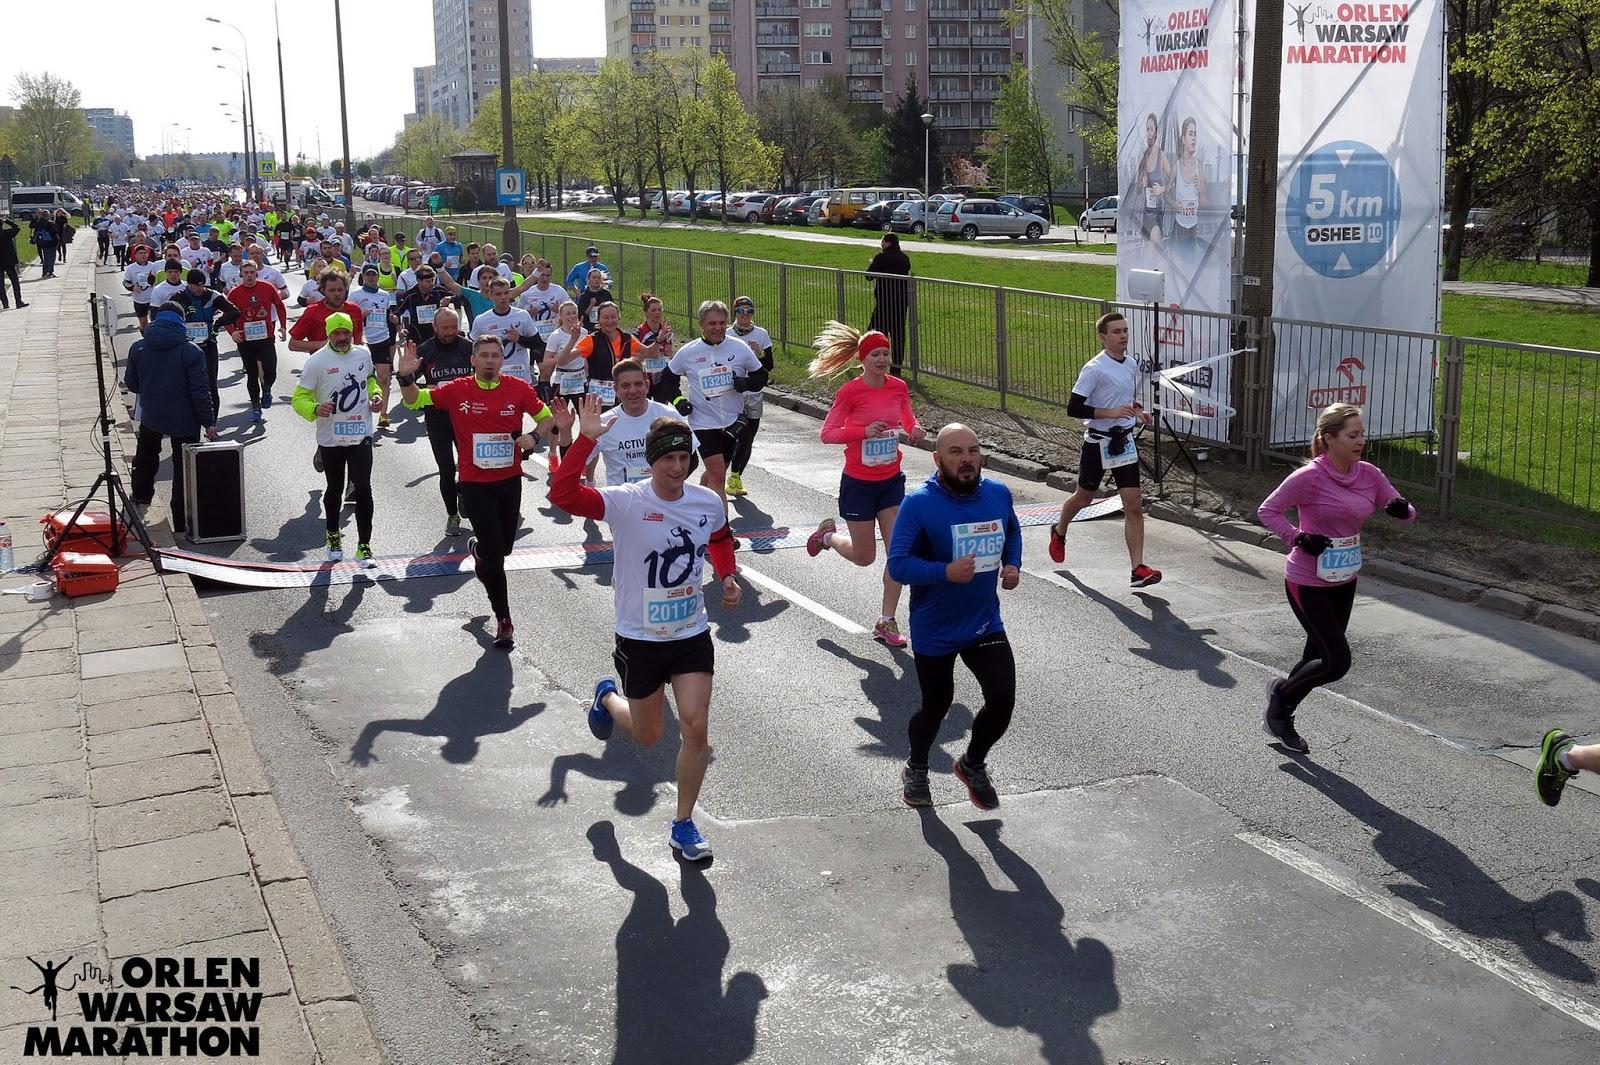 bieg oshee 5km